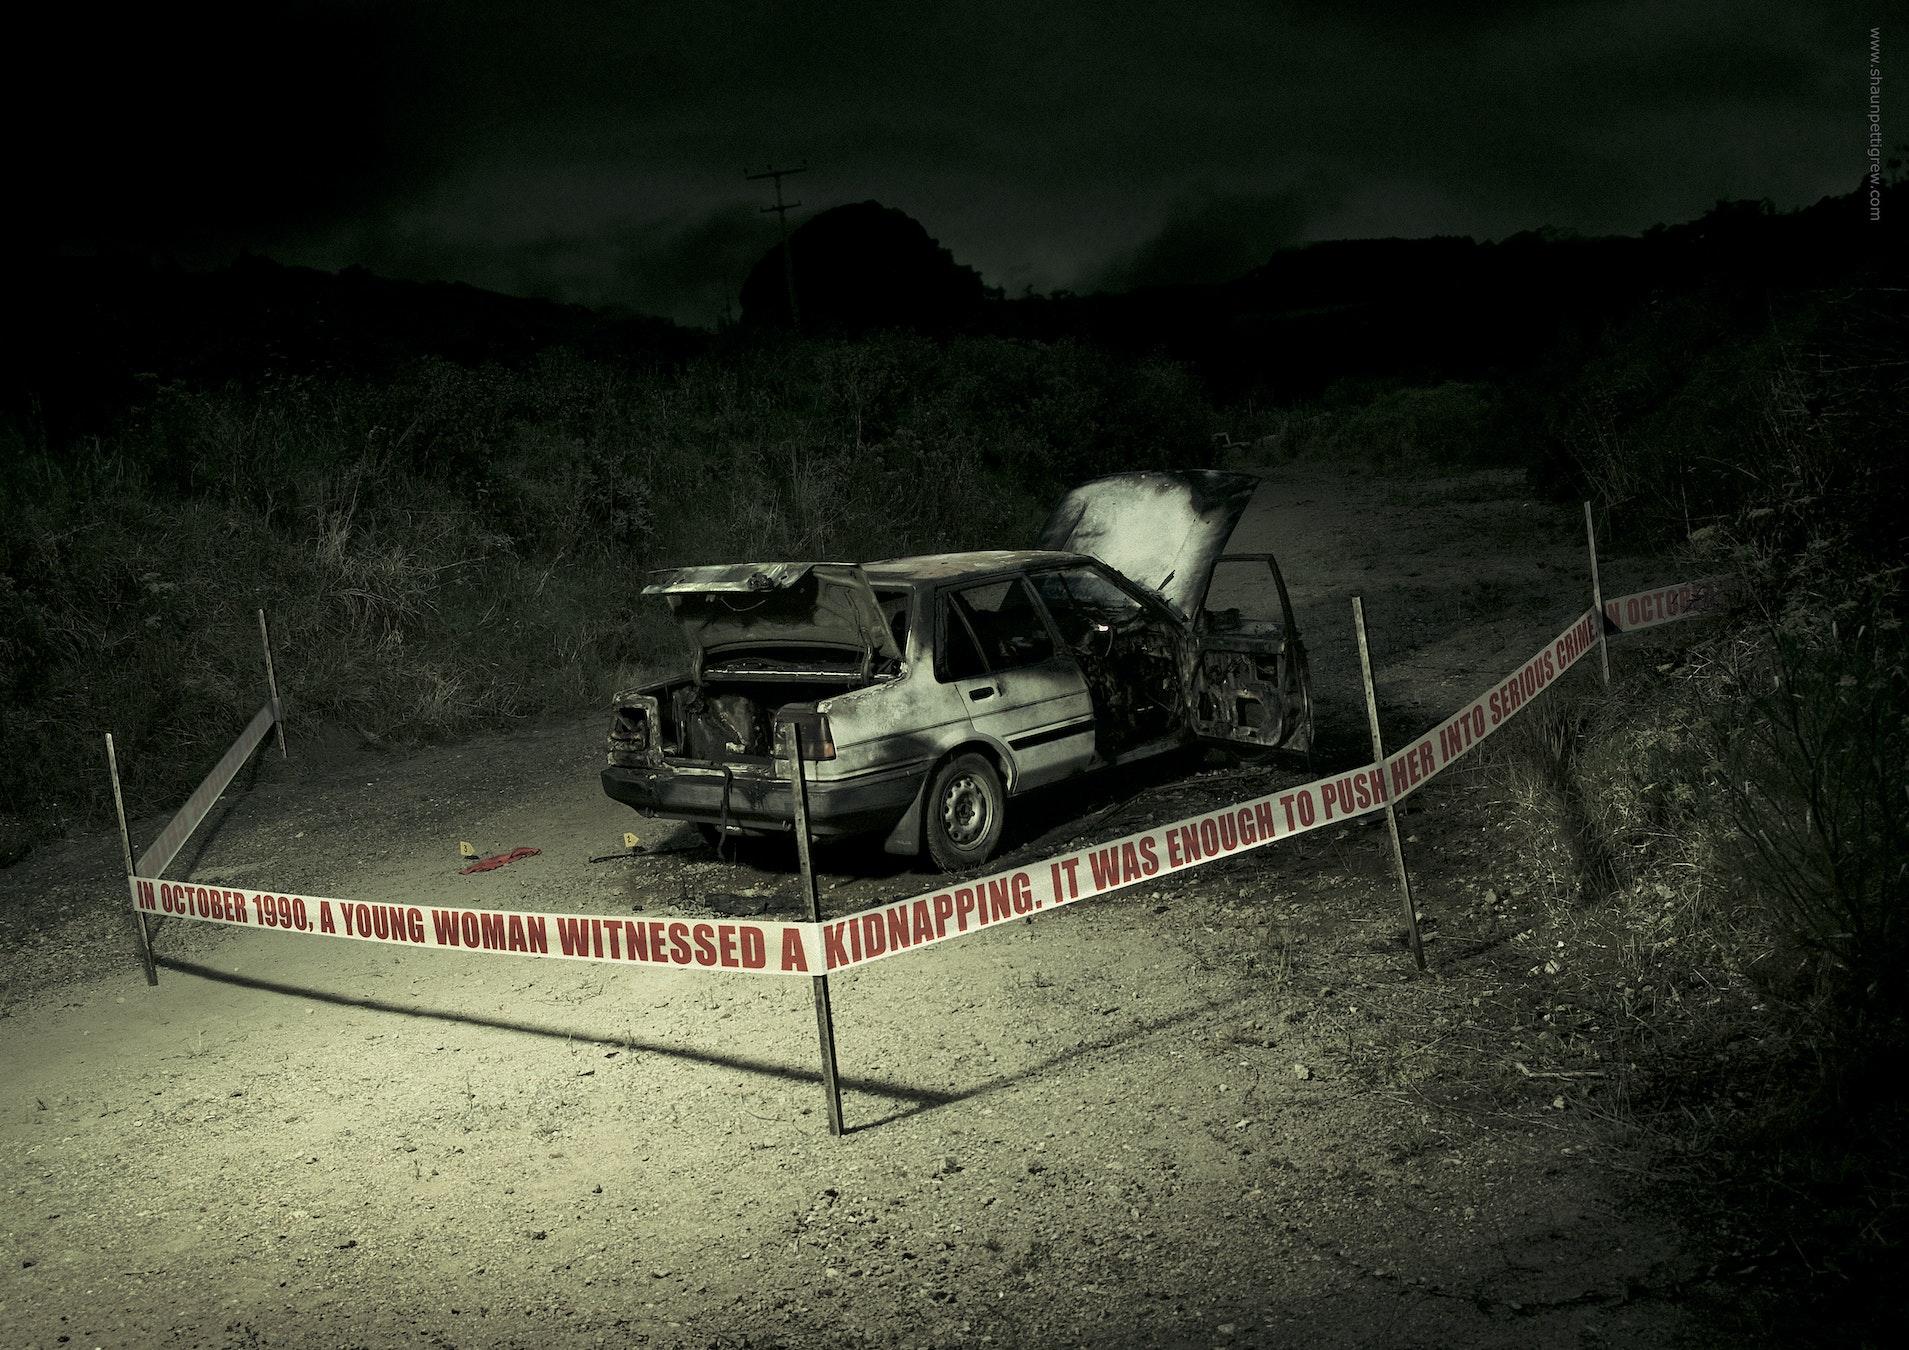 Police_Burnt Car_HR